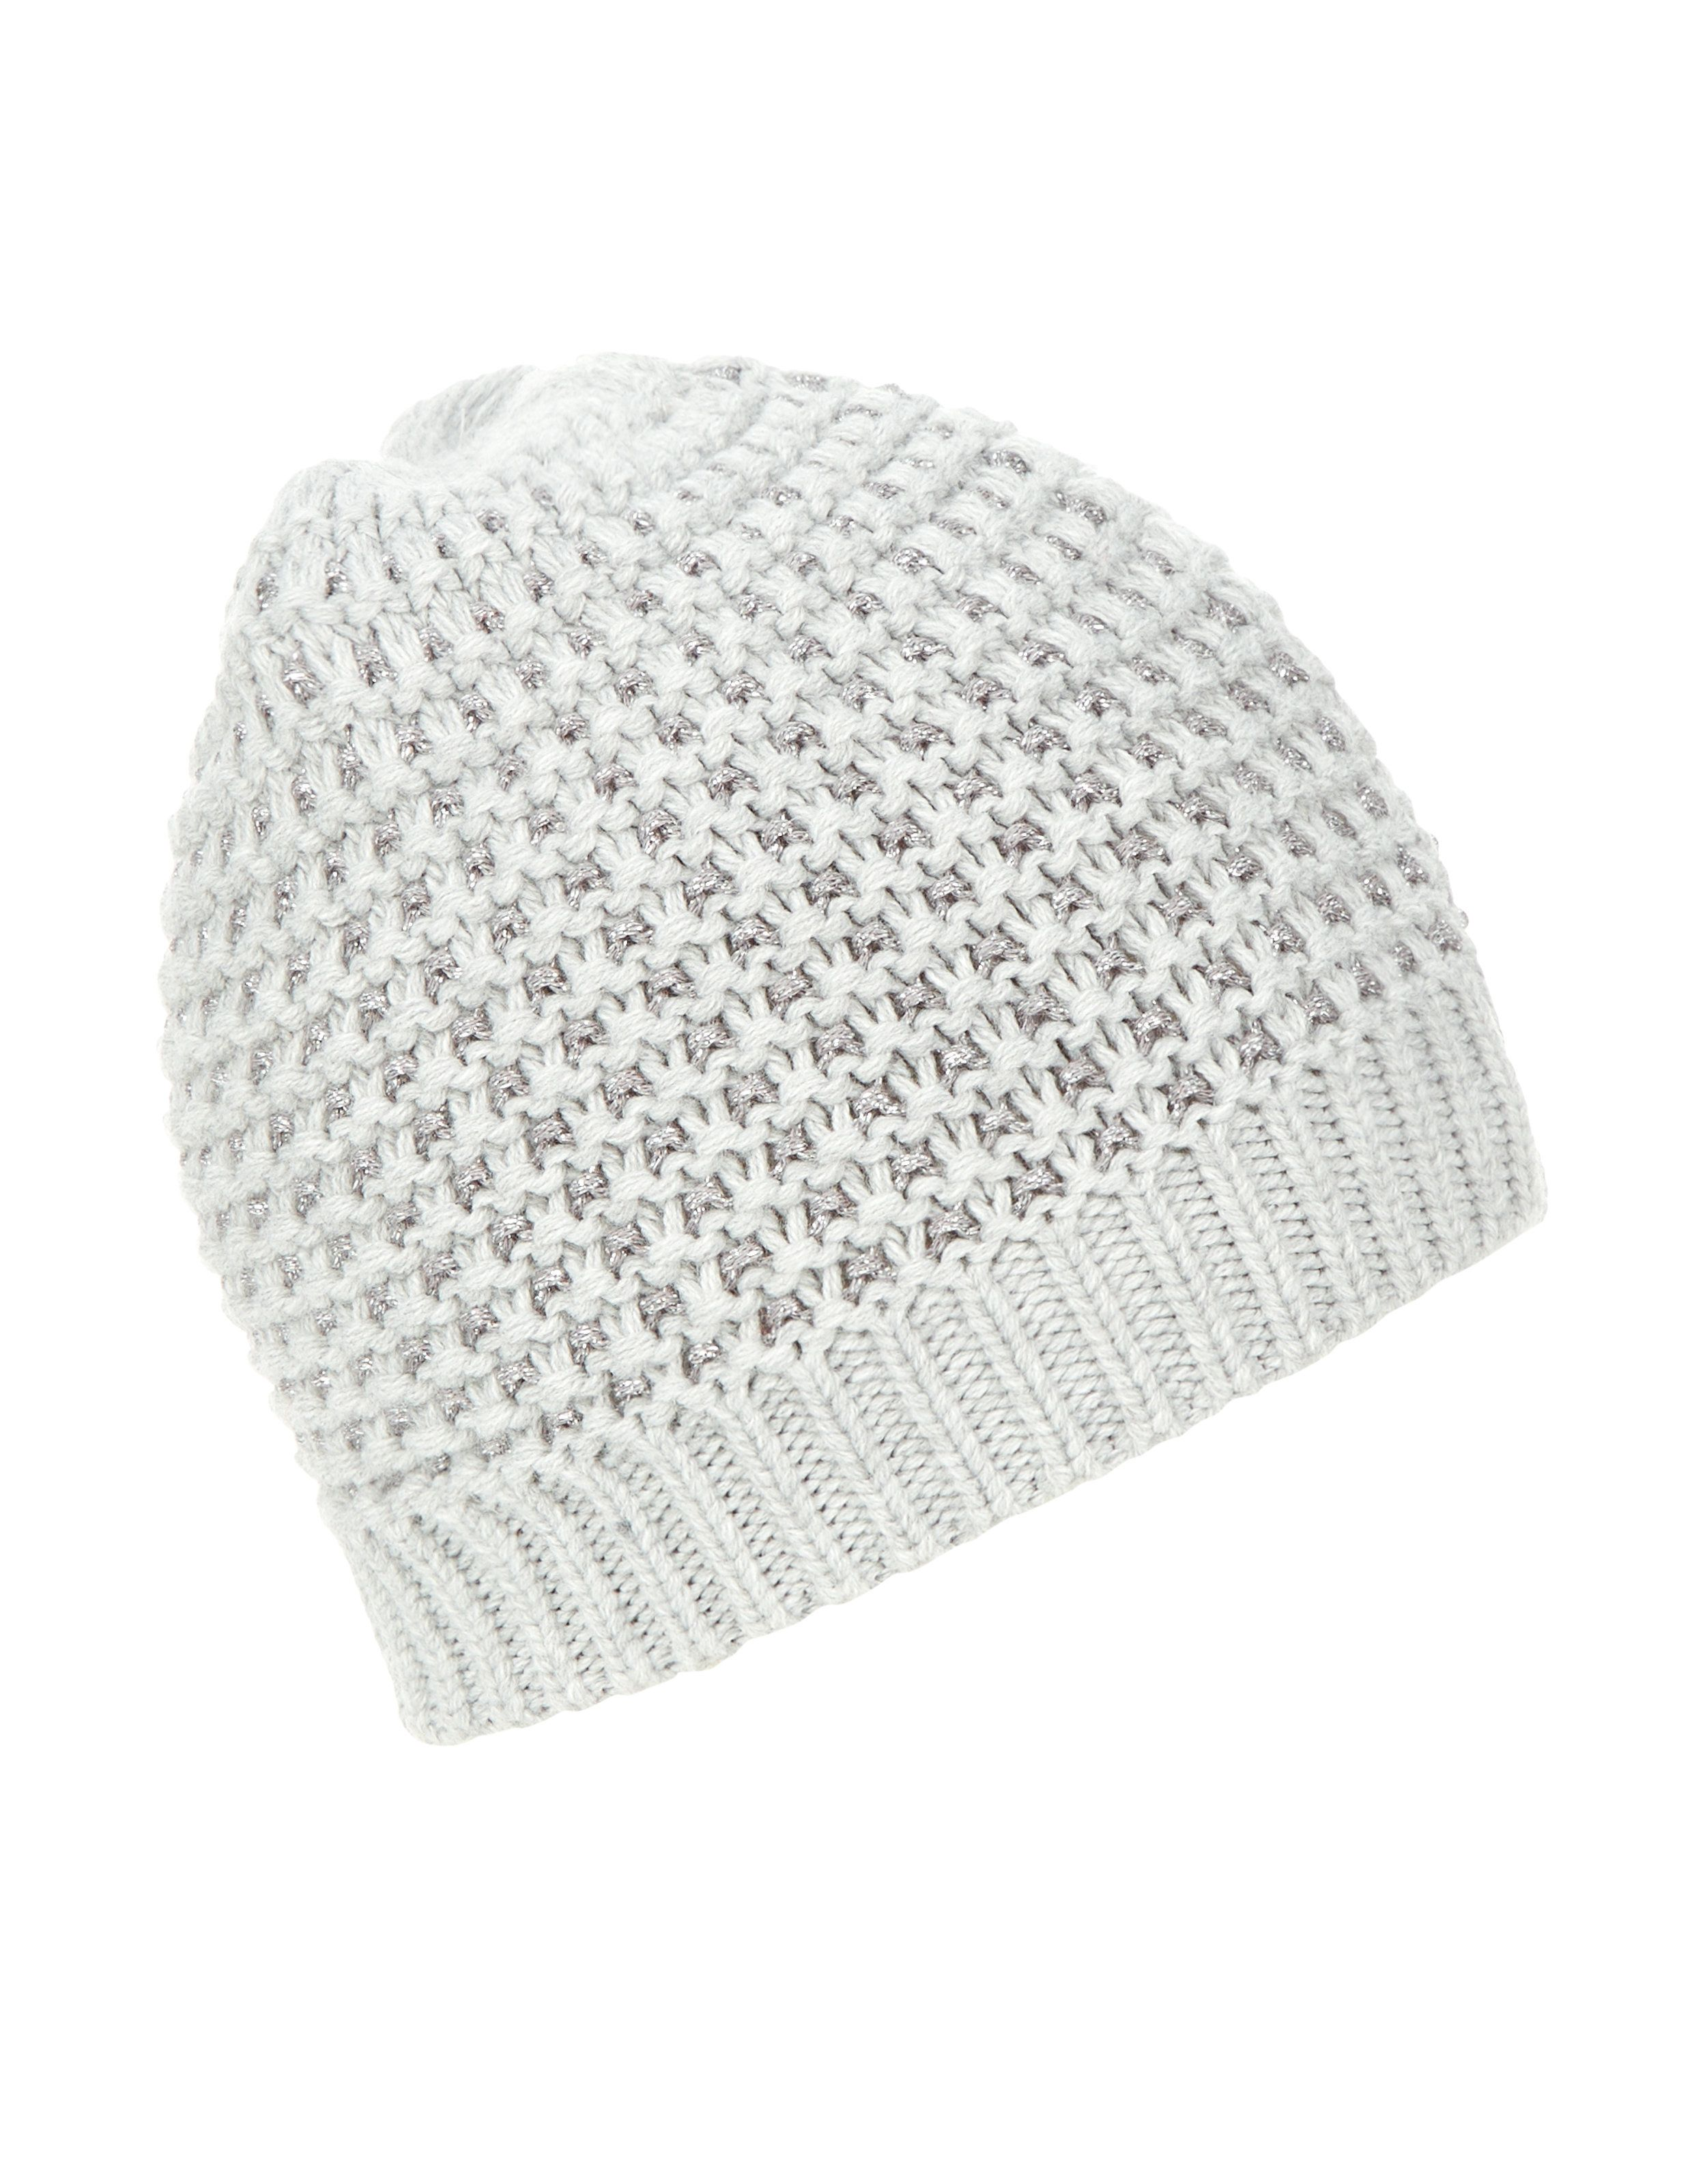 99c1d740622 Metallic Bobble Beanie Hat